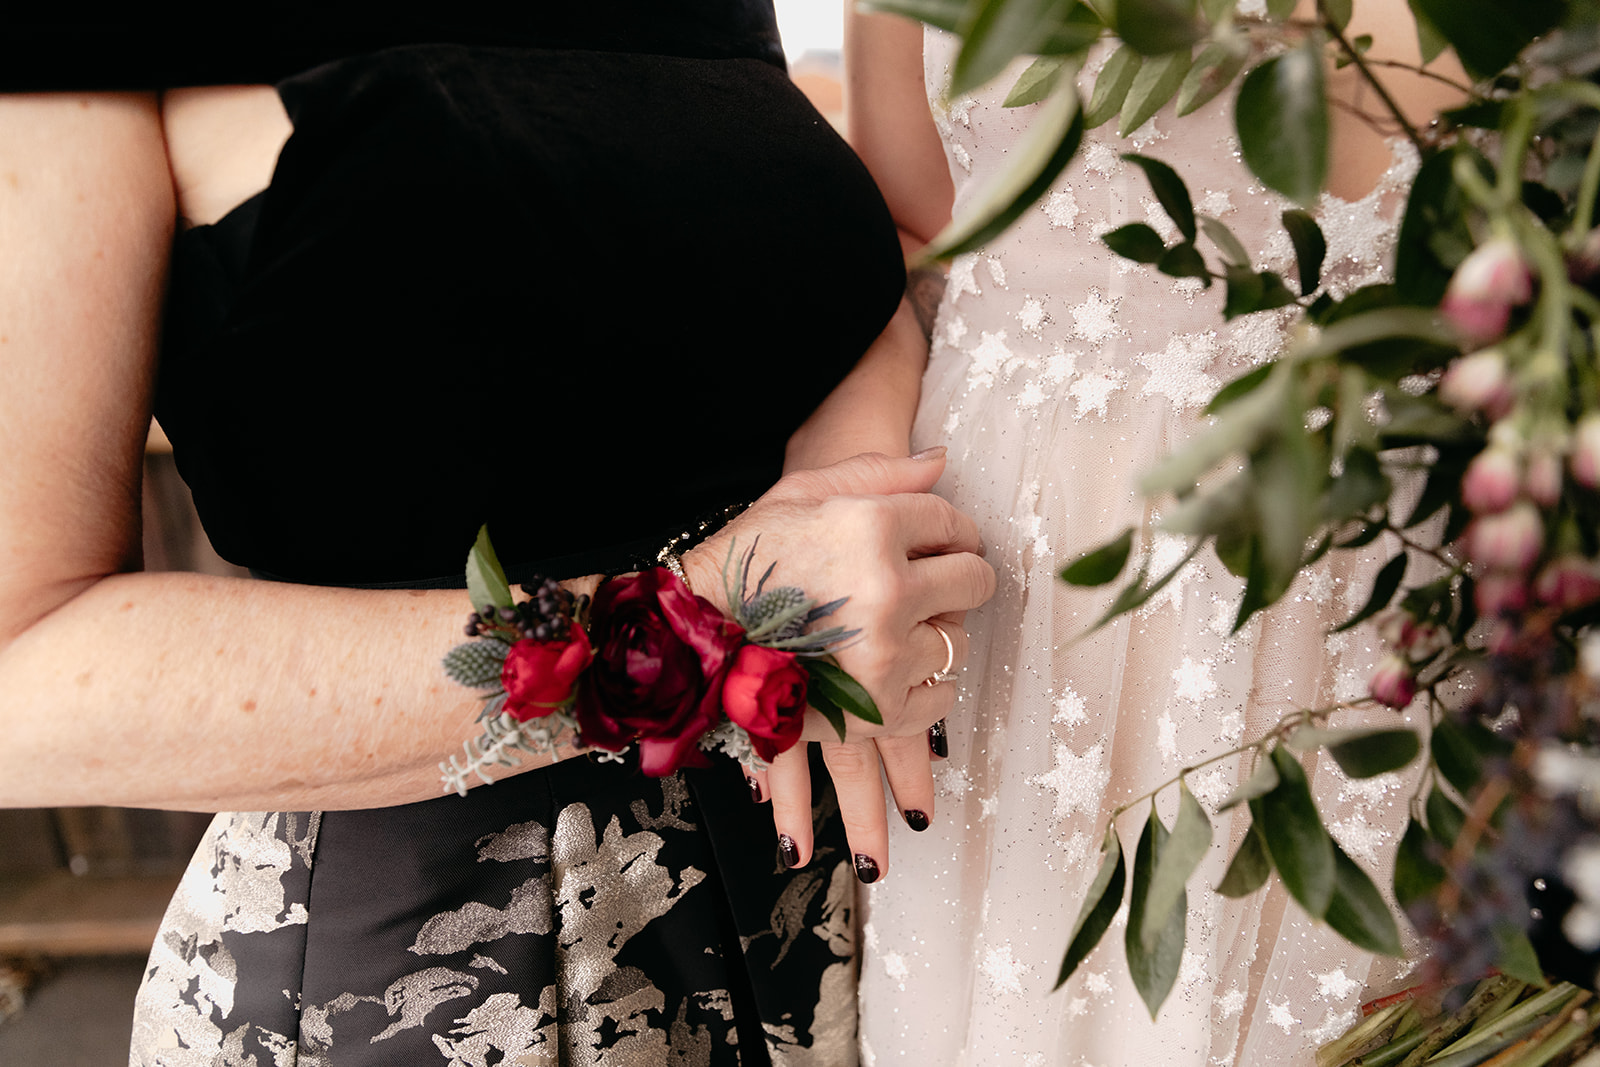 Burgundy and marsala wristlet corsage for the mother of the bride! Nashville Wedding flowers at Marathon Music Works.